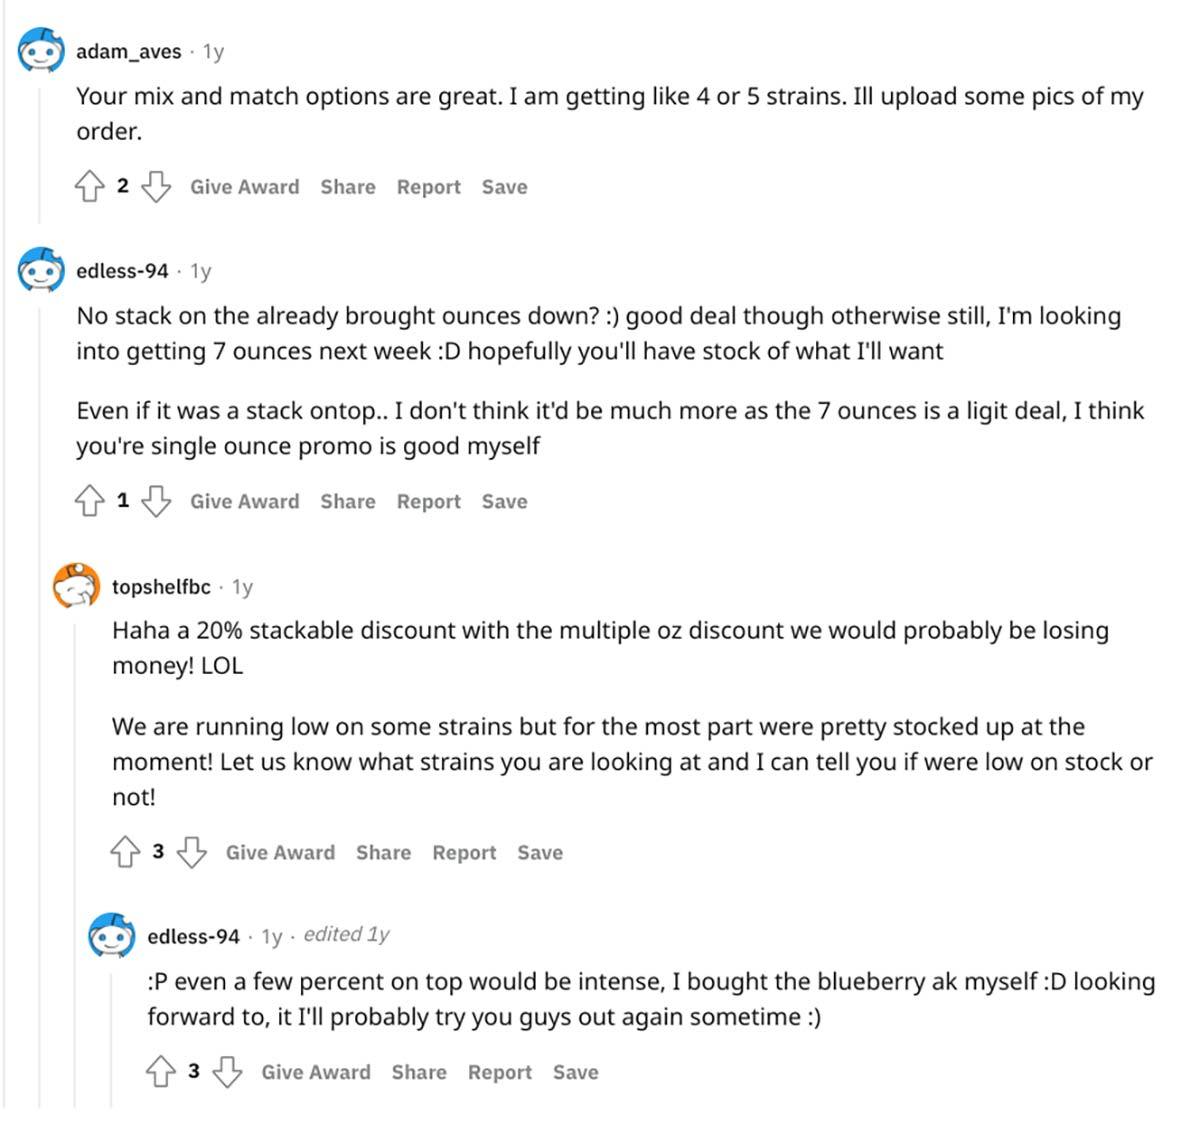 Top Shelf BC reviews on Reddit